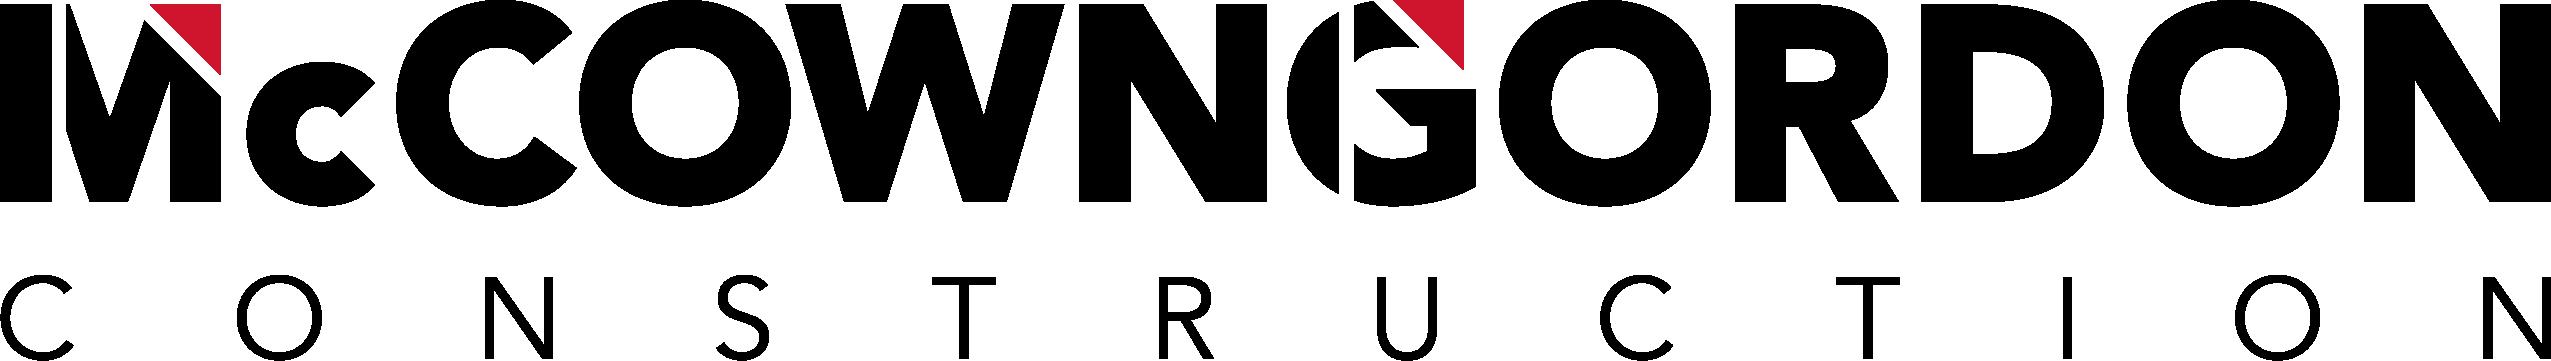 McCownGordon-logo_horiz